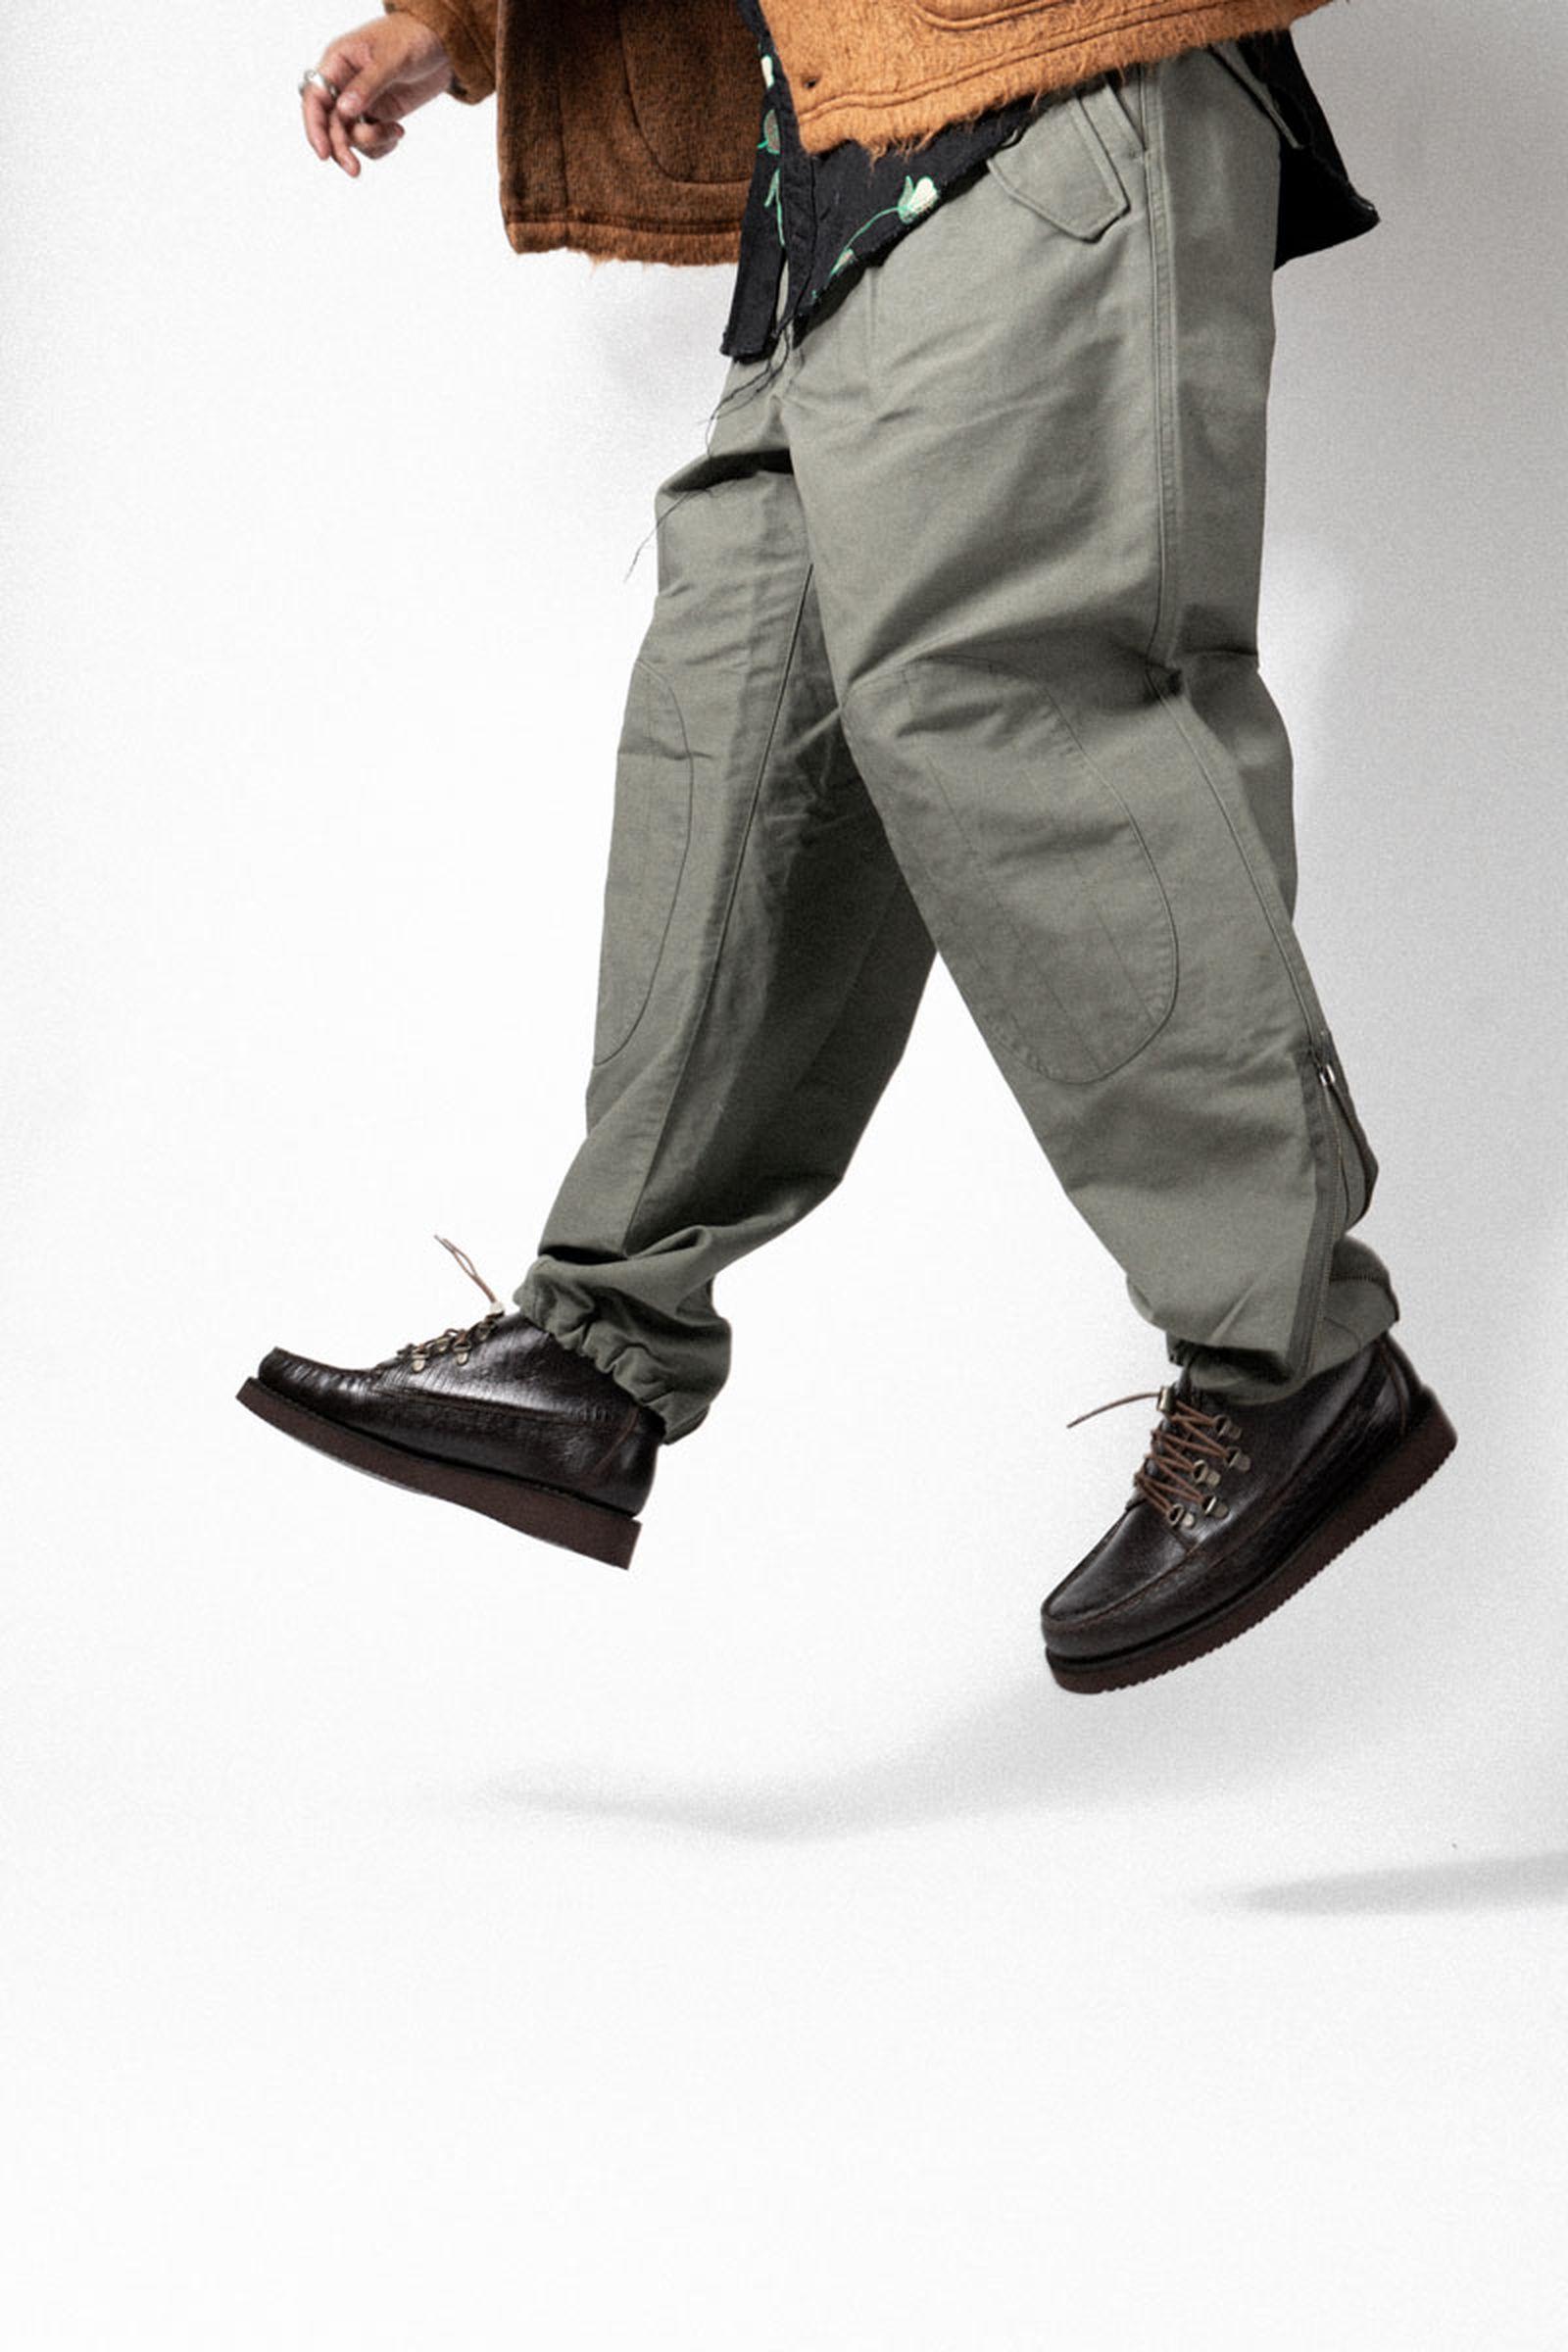 engineered-garments-sebago-fw21-release-info-05